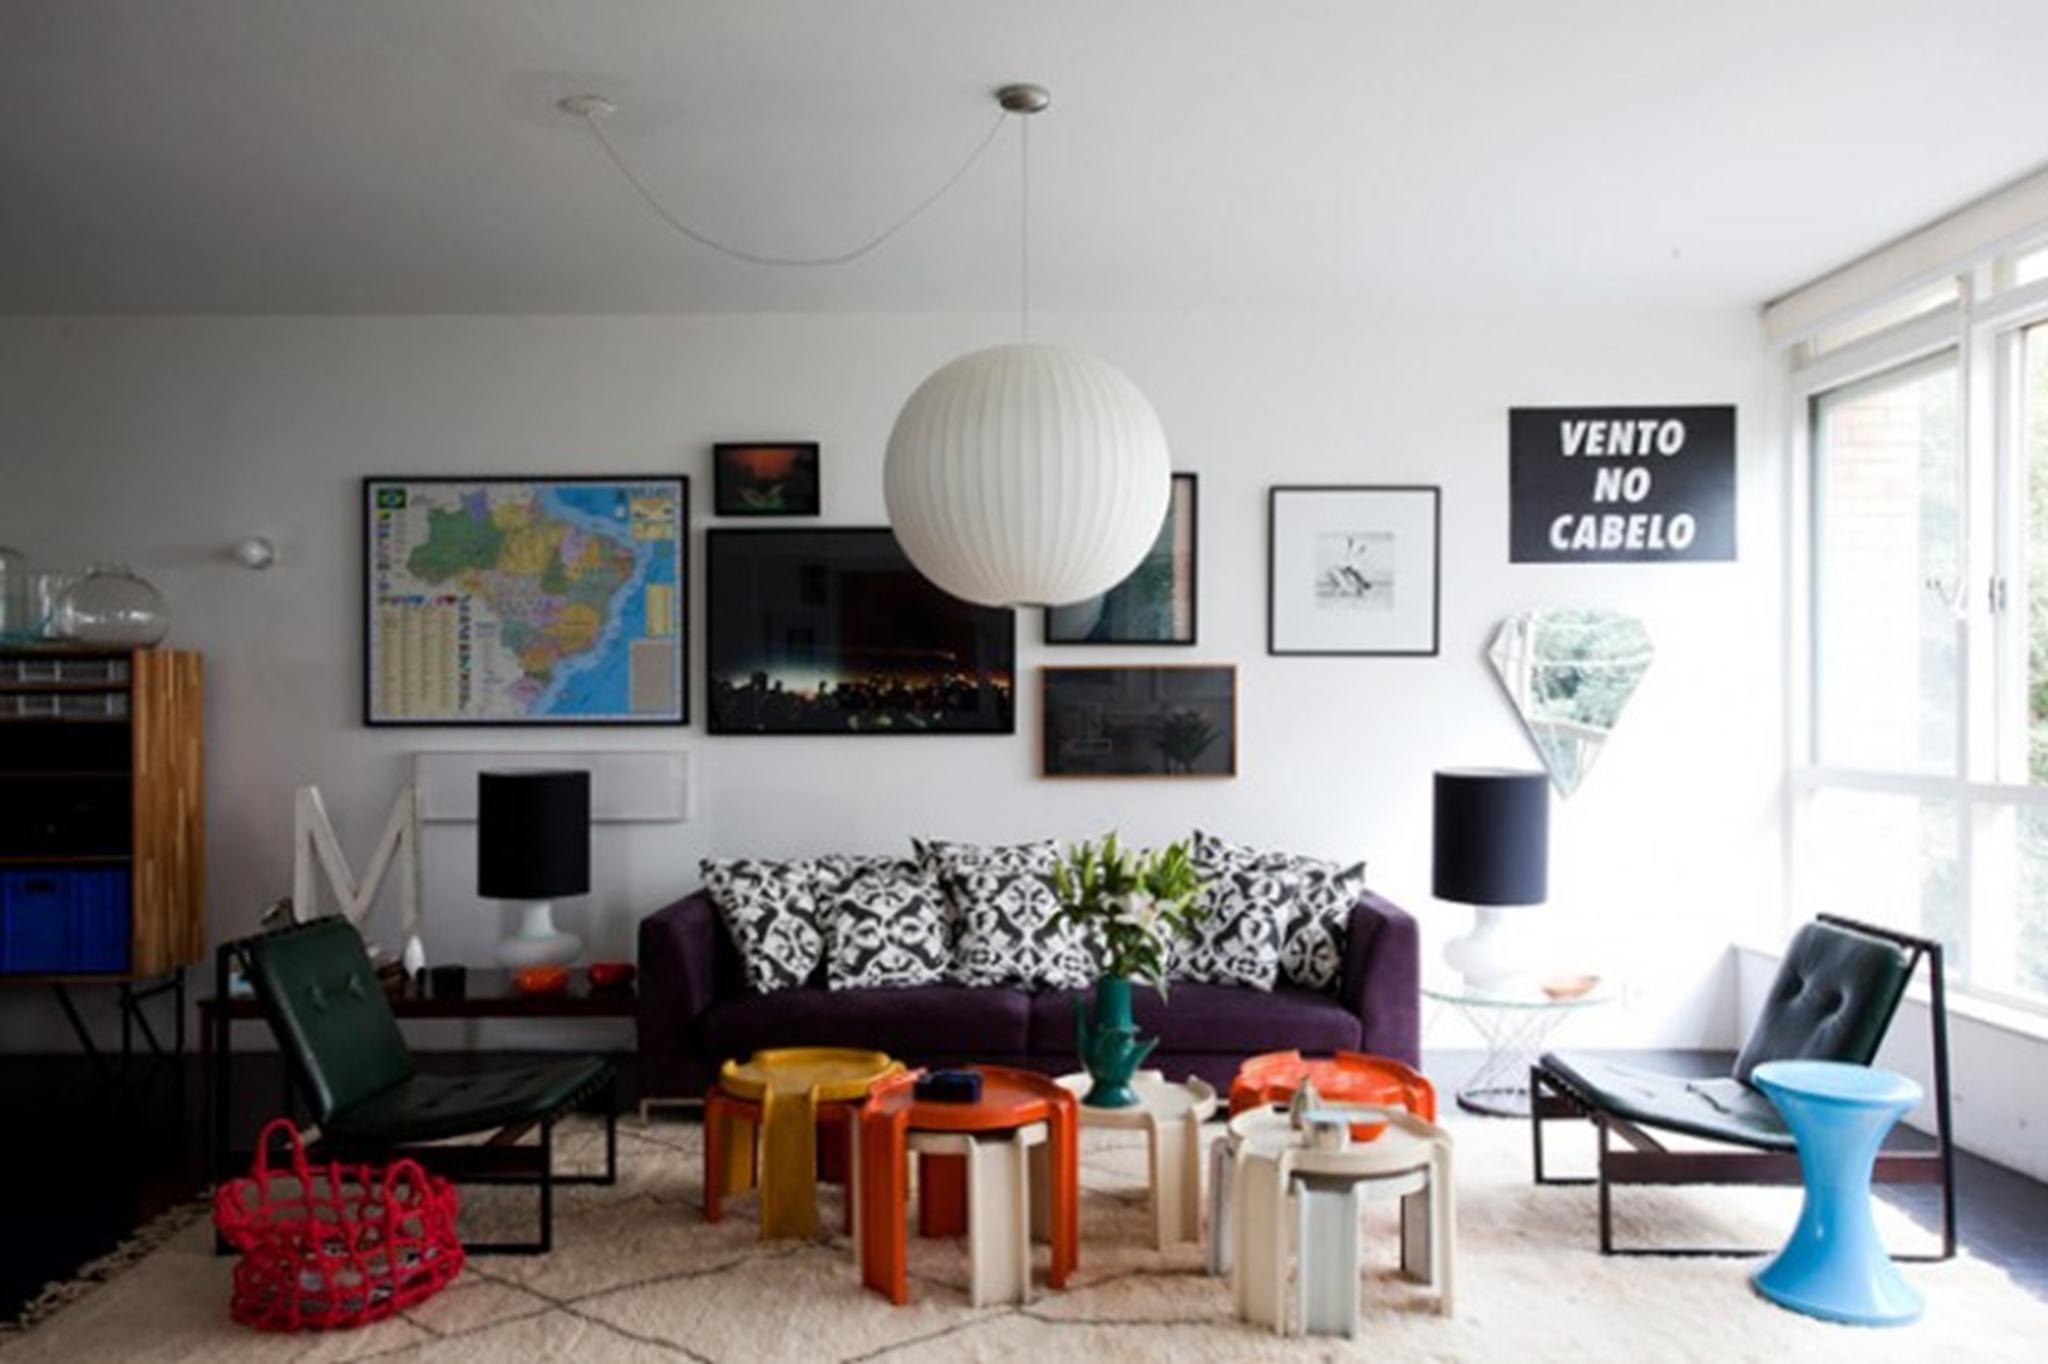 architects-apartment-665x443 (Copy)